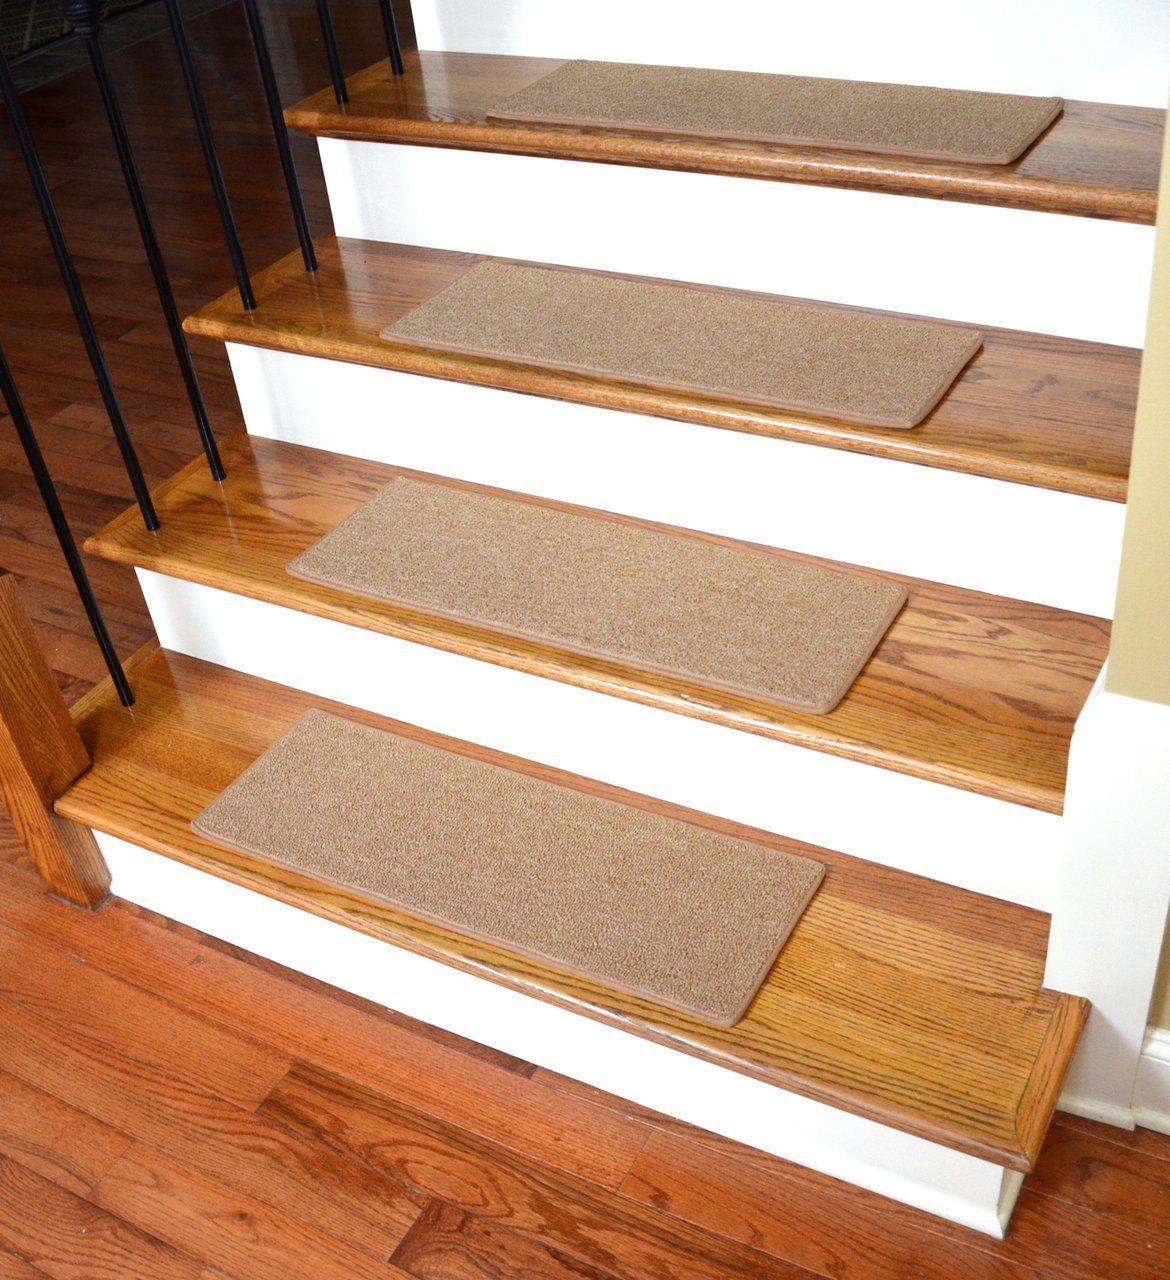 Superb Dean Non Slip DIY Carpet Stair Treads   Gold, 15 Treads